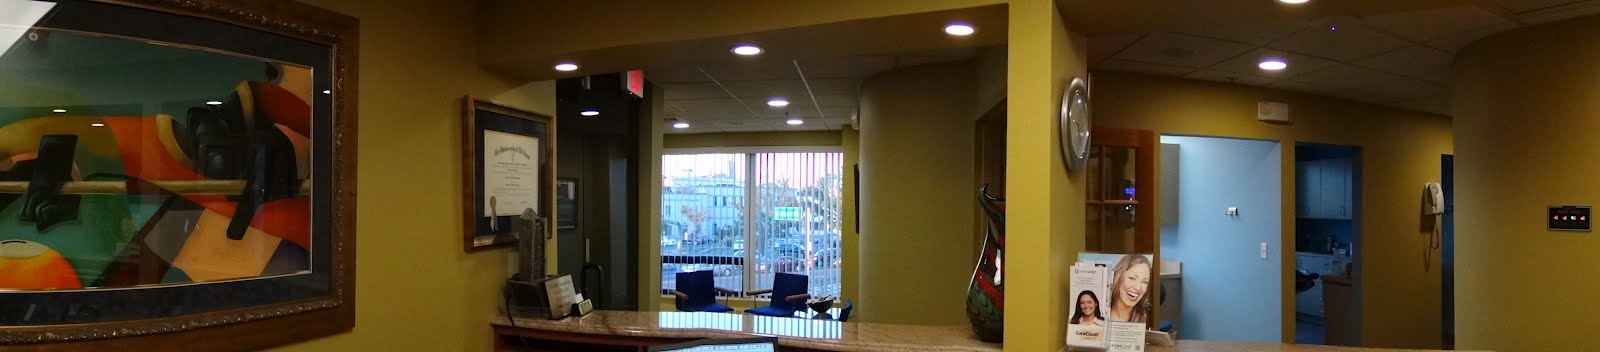 Dr. Leonard Sealy - Rockville Centre, Long Island Premier  Dental Provider